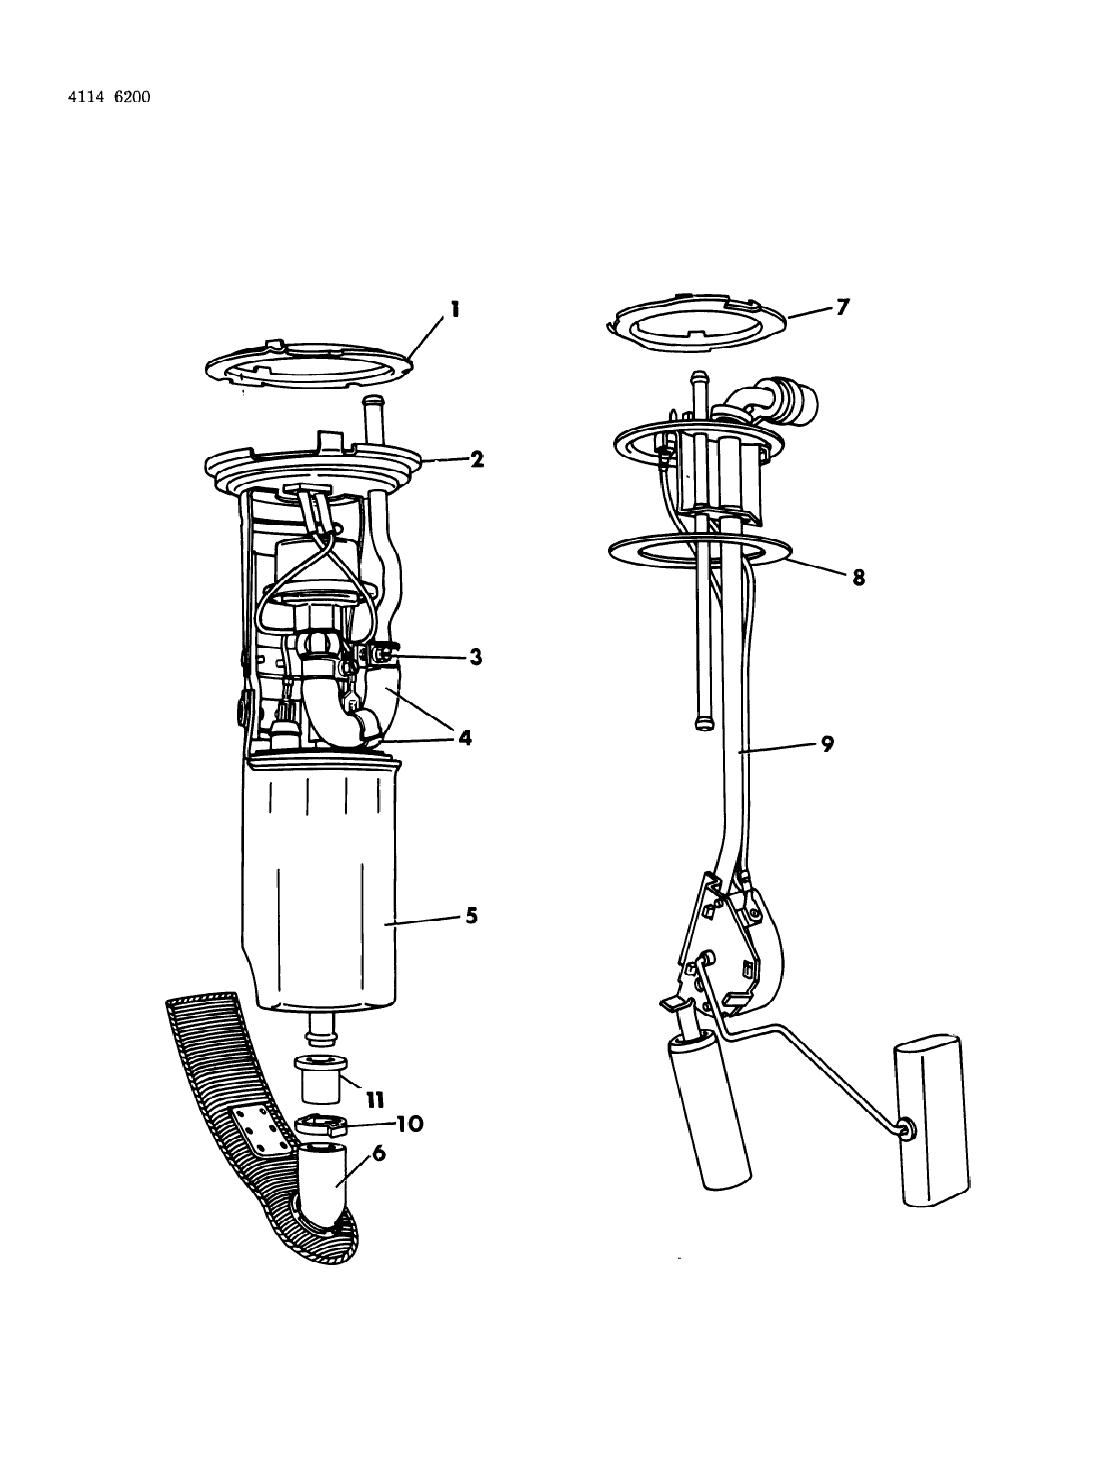 Chrysler Lebaron Fuel Pump Amp Sending Unit